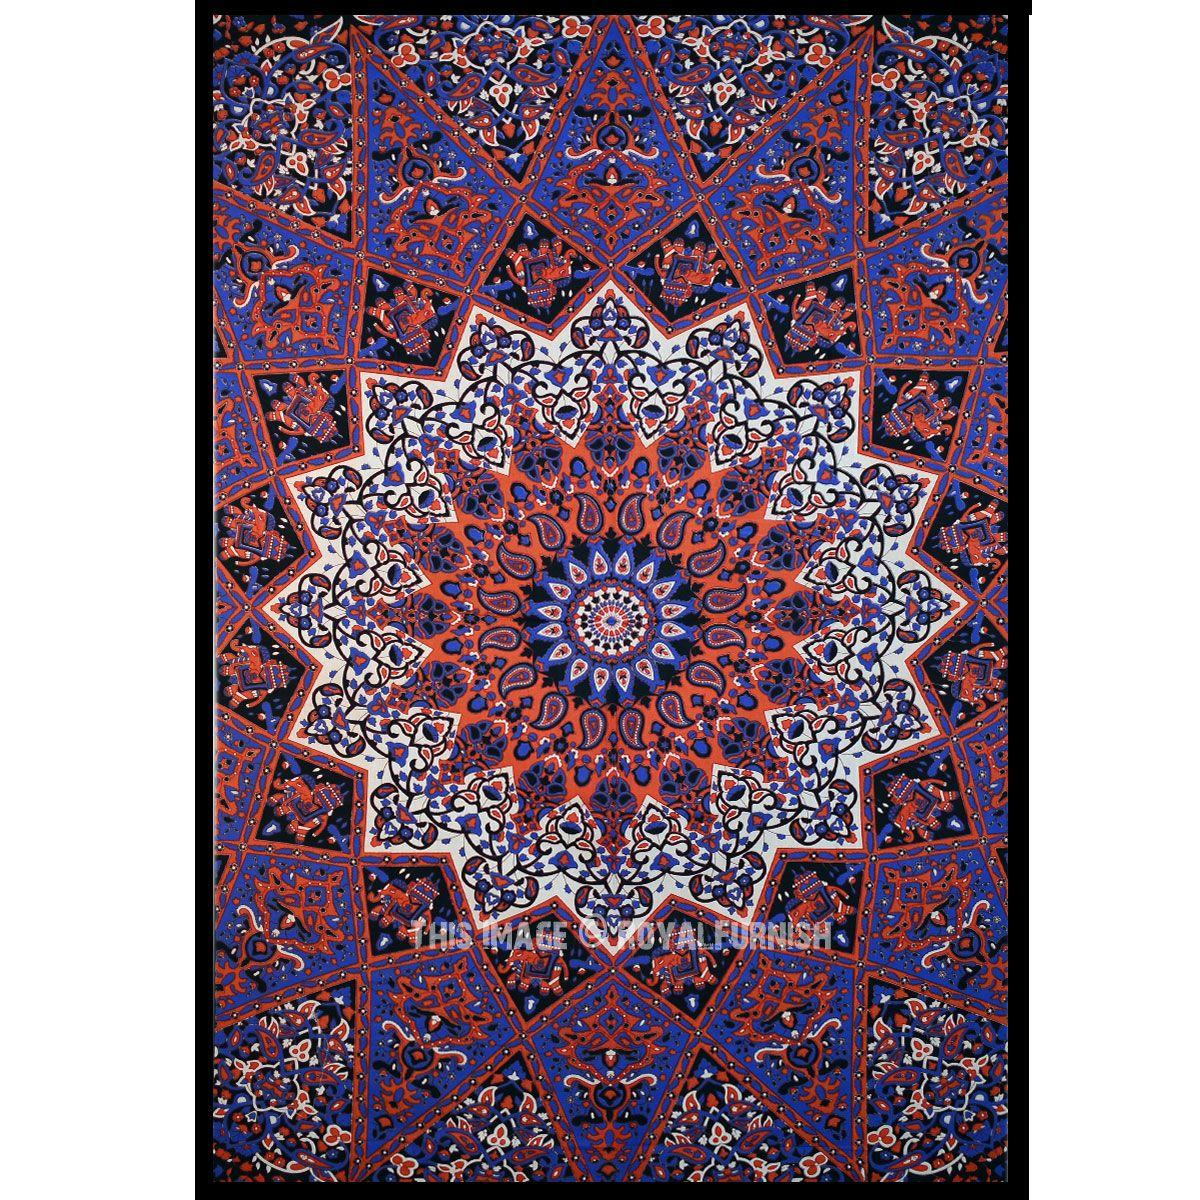 Blue multi elephants sun ombre mandala wall tapestry royalfurnish - Tapestry Plum And Bow Medallion Star Elephant Mandala Wall